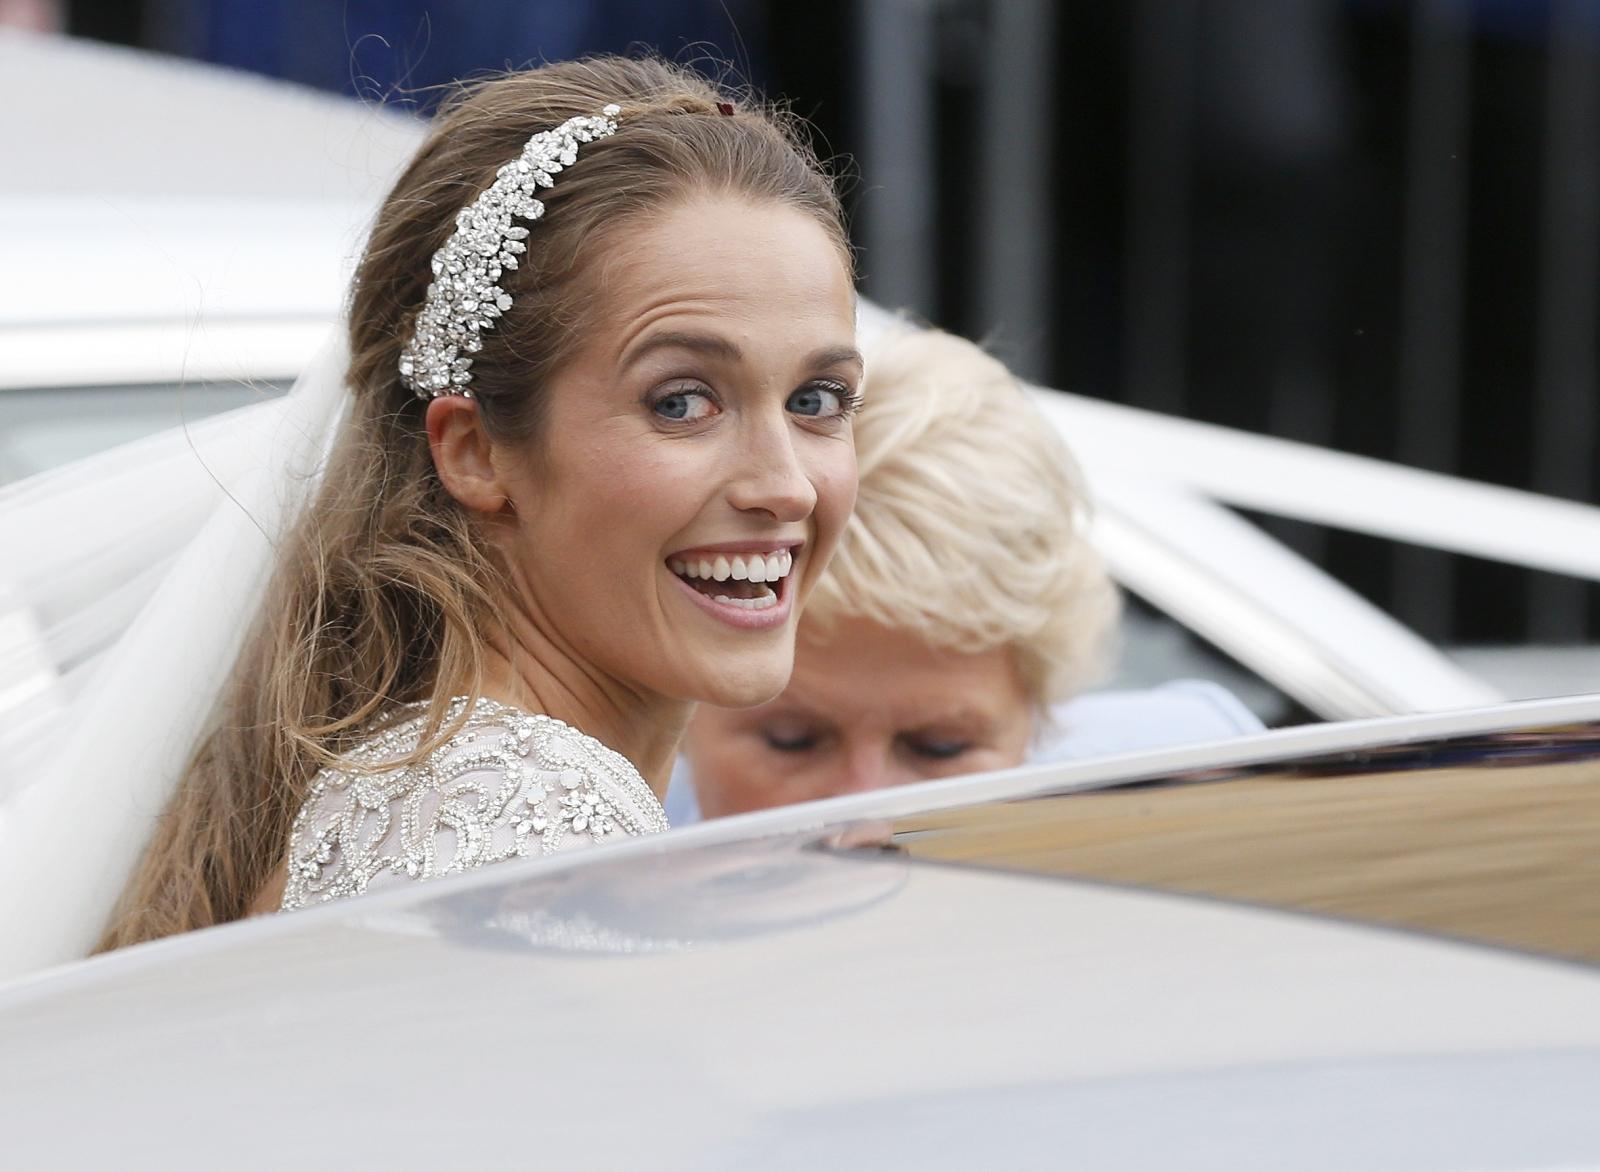 Kim Sears arrives for her wedding